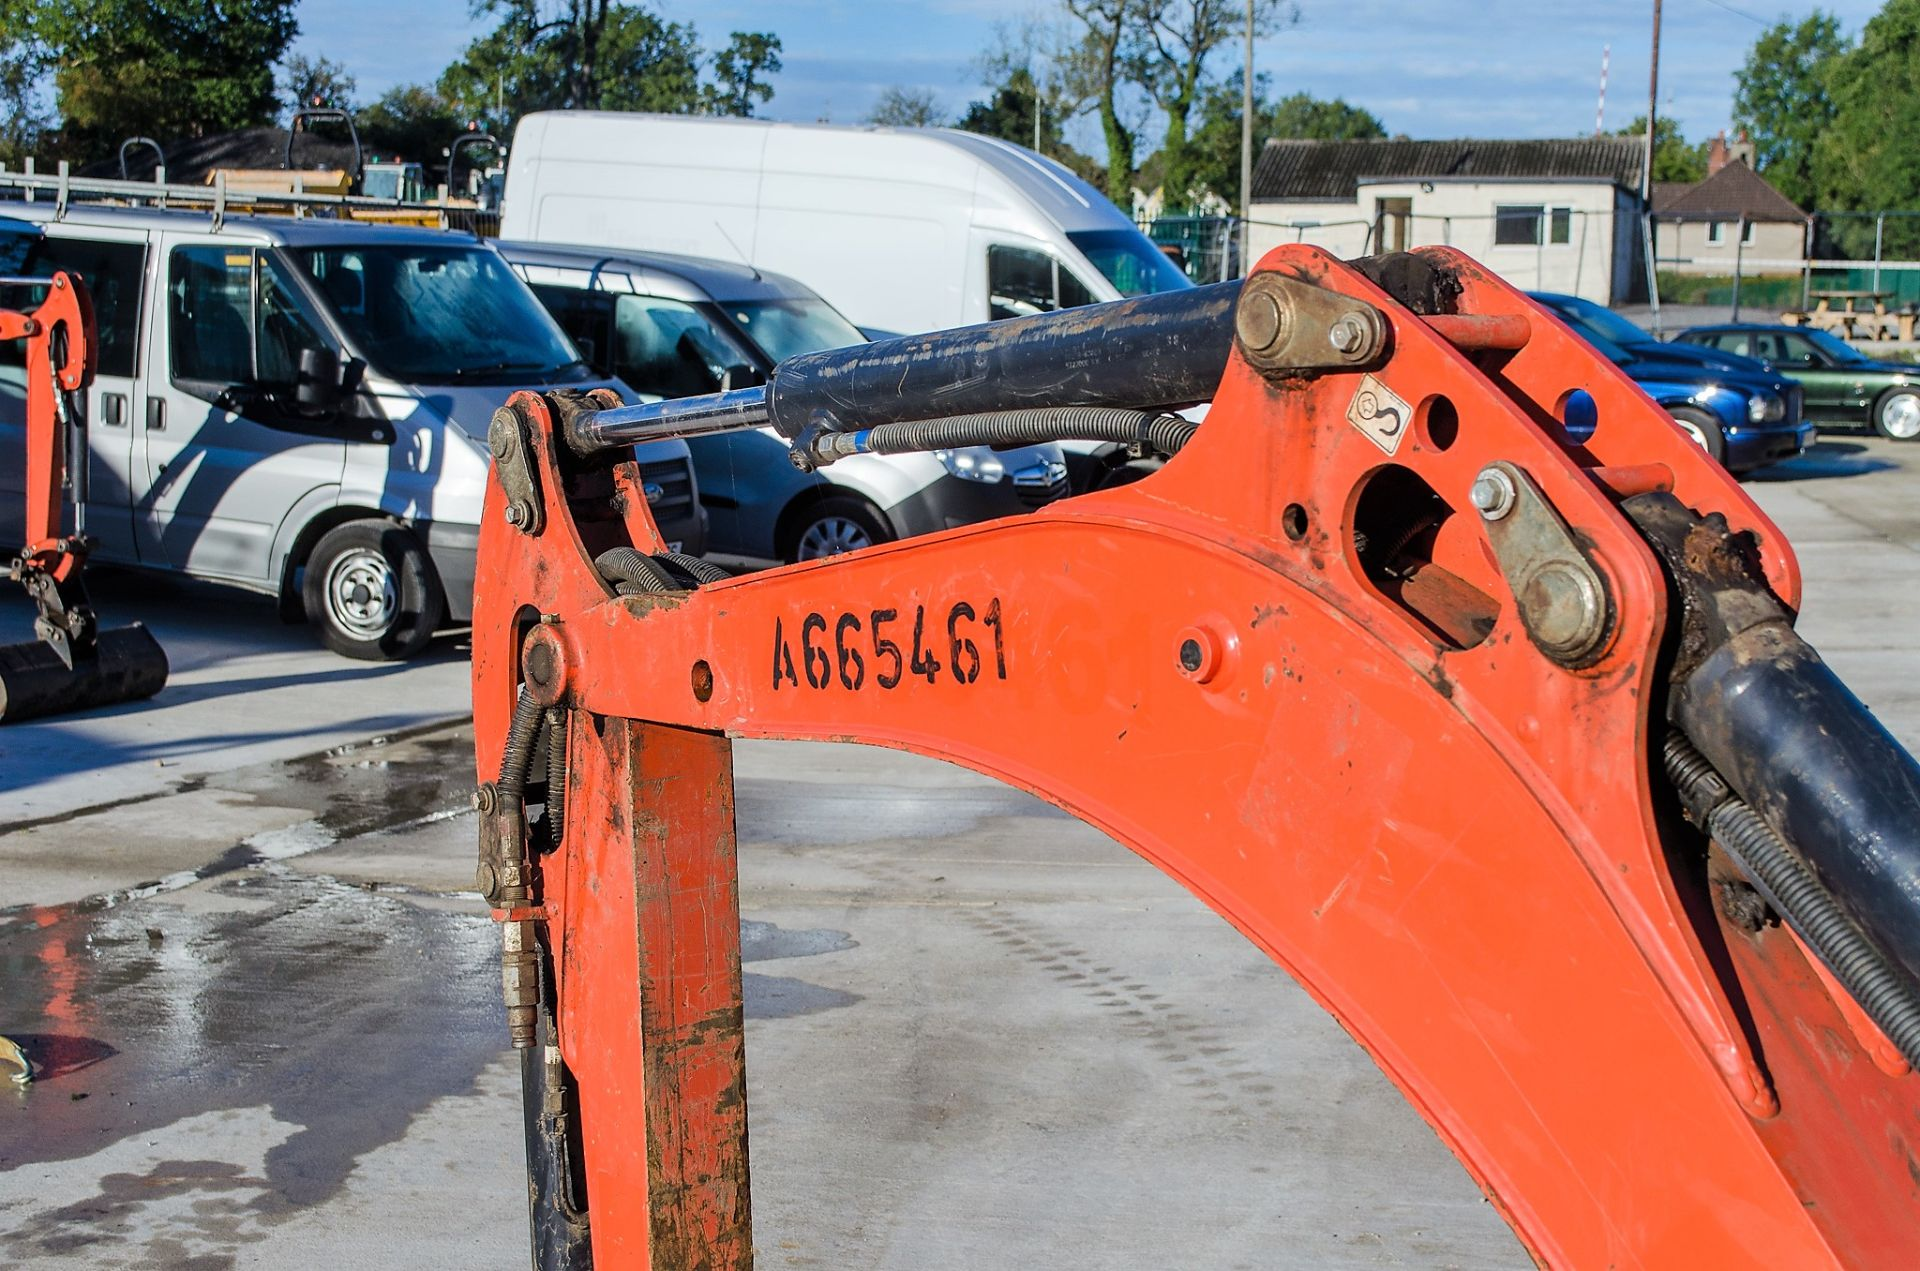 Kubota KX016-4 1.5 tonne rubber tracked mini excavator Year: 2015 S/N: 58688 Recorded Hours: 1736 - Image 14 of 19